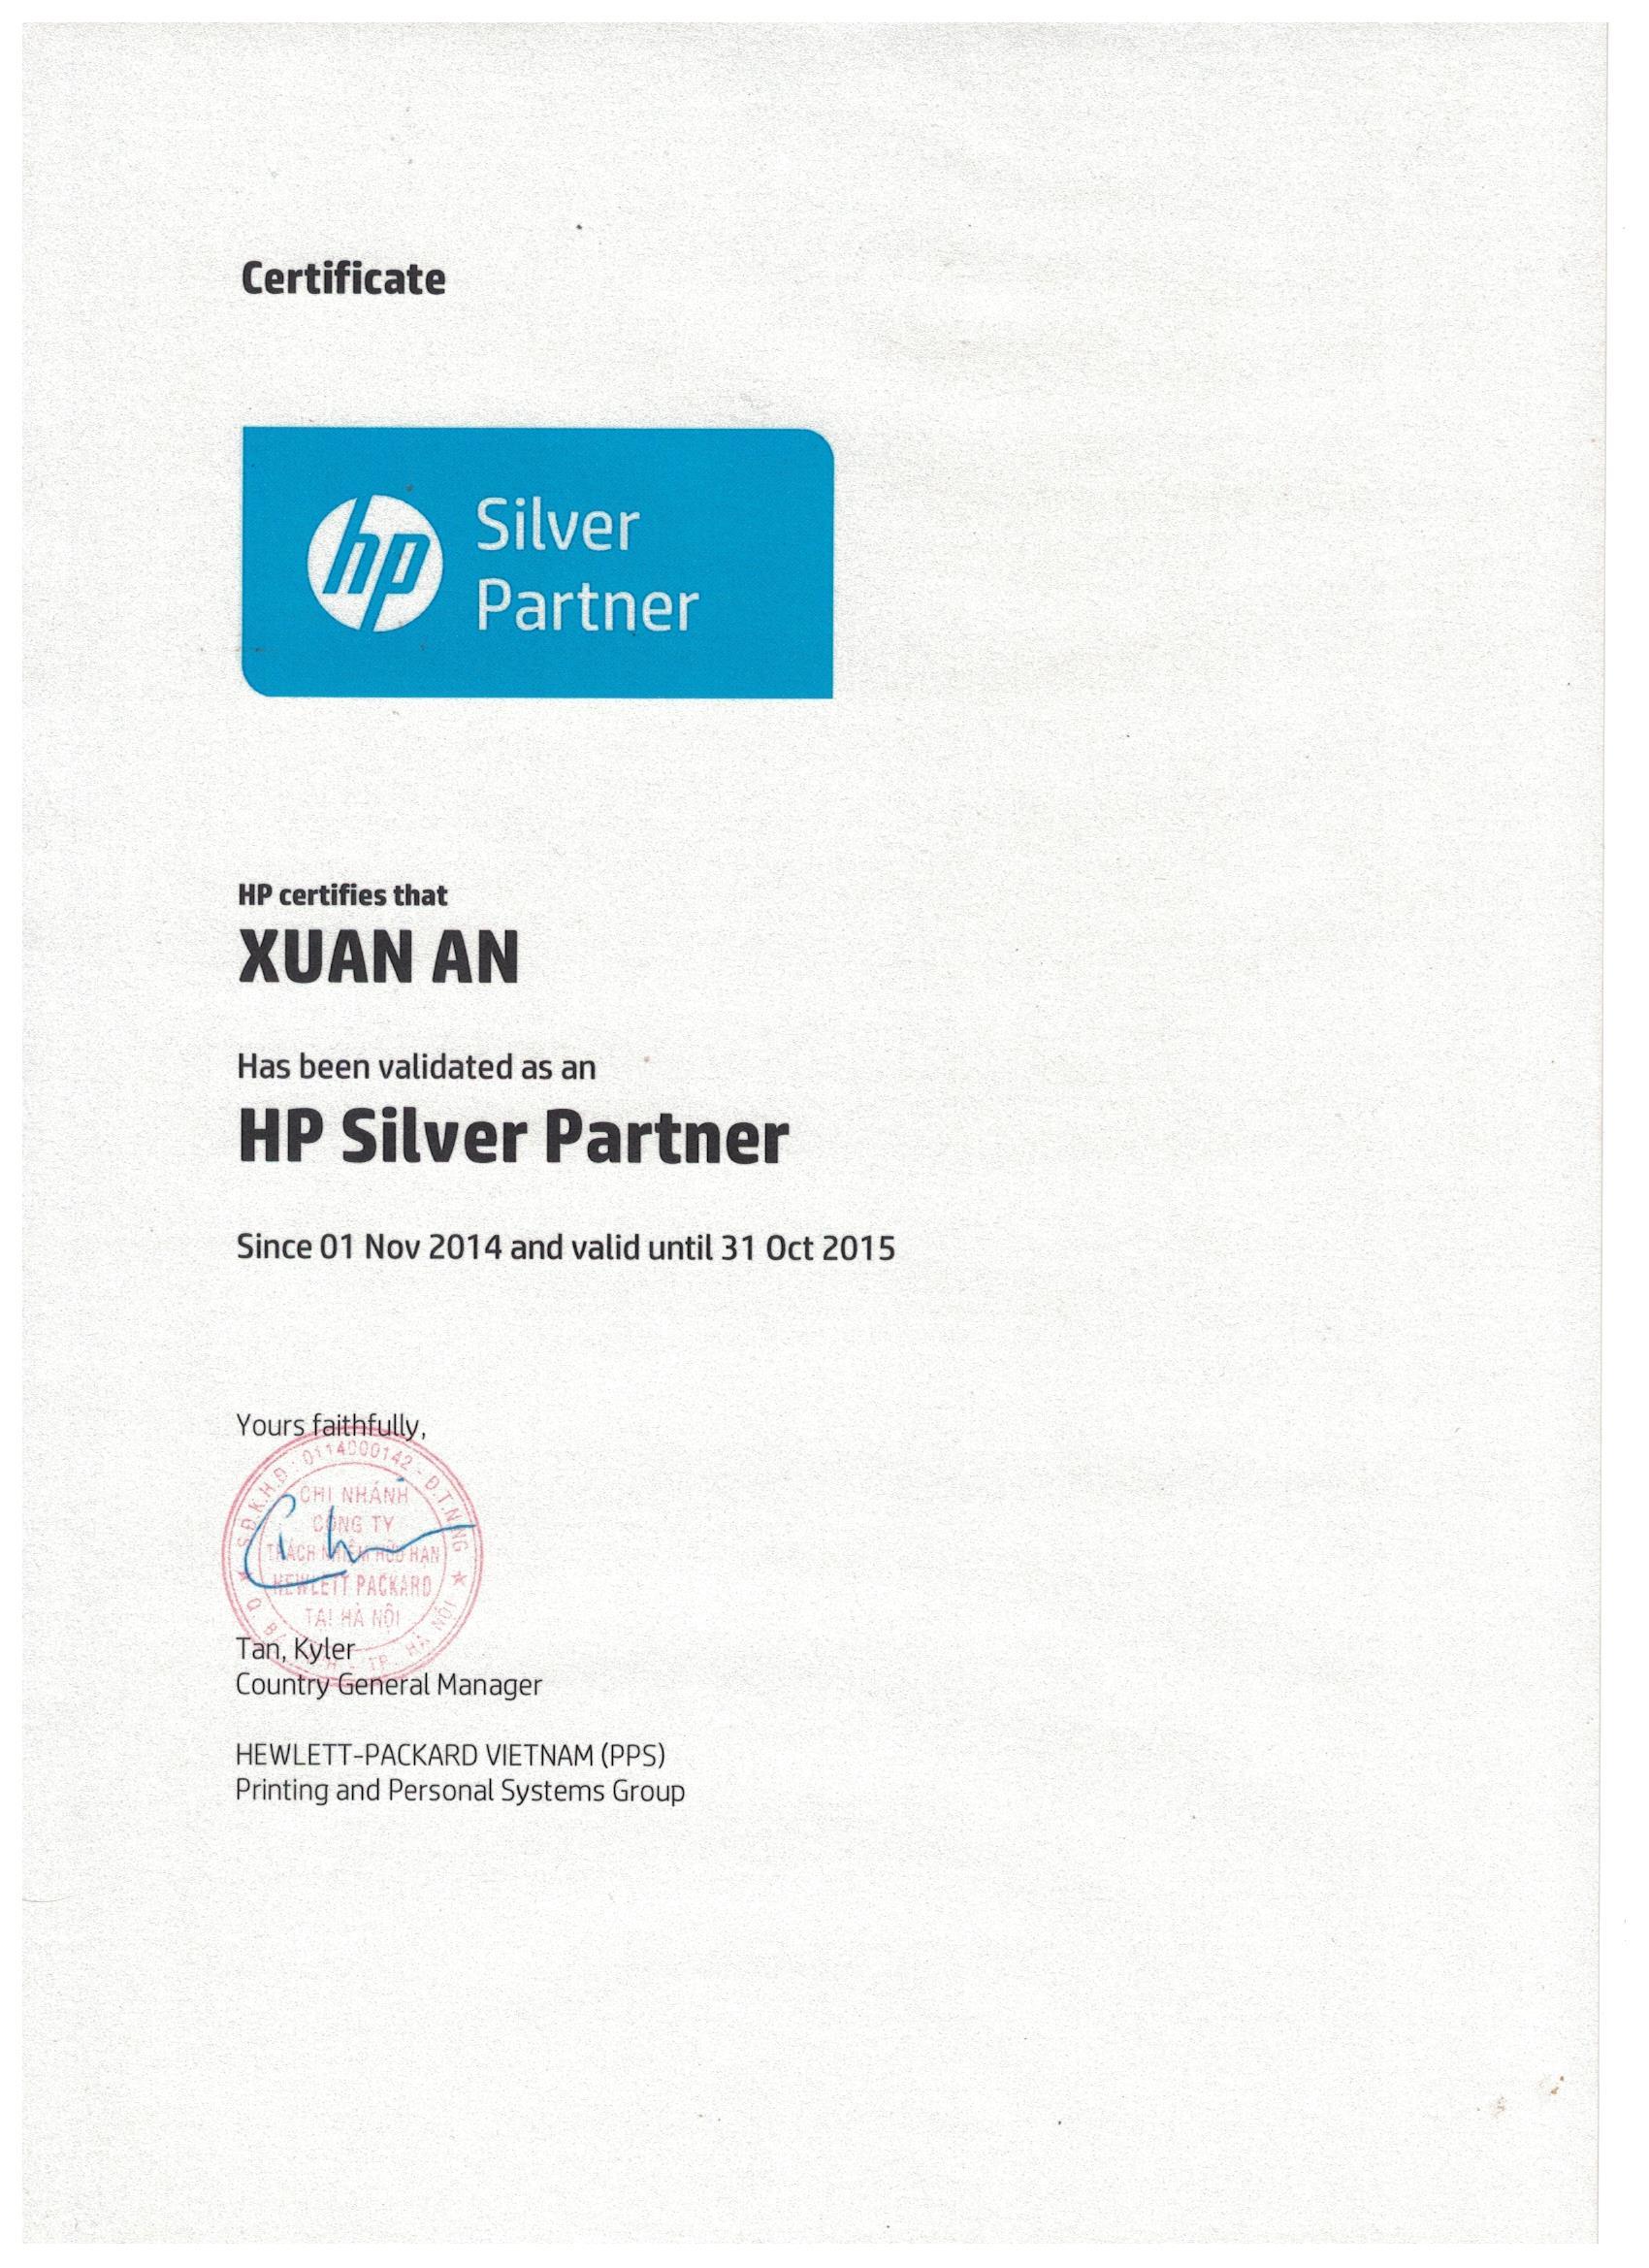 HP Probook 430 G5 - 2XR79PA (Silver)